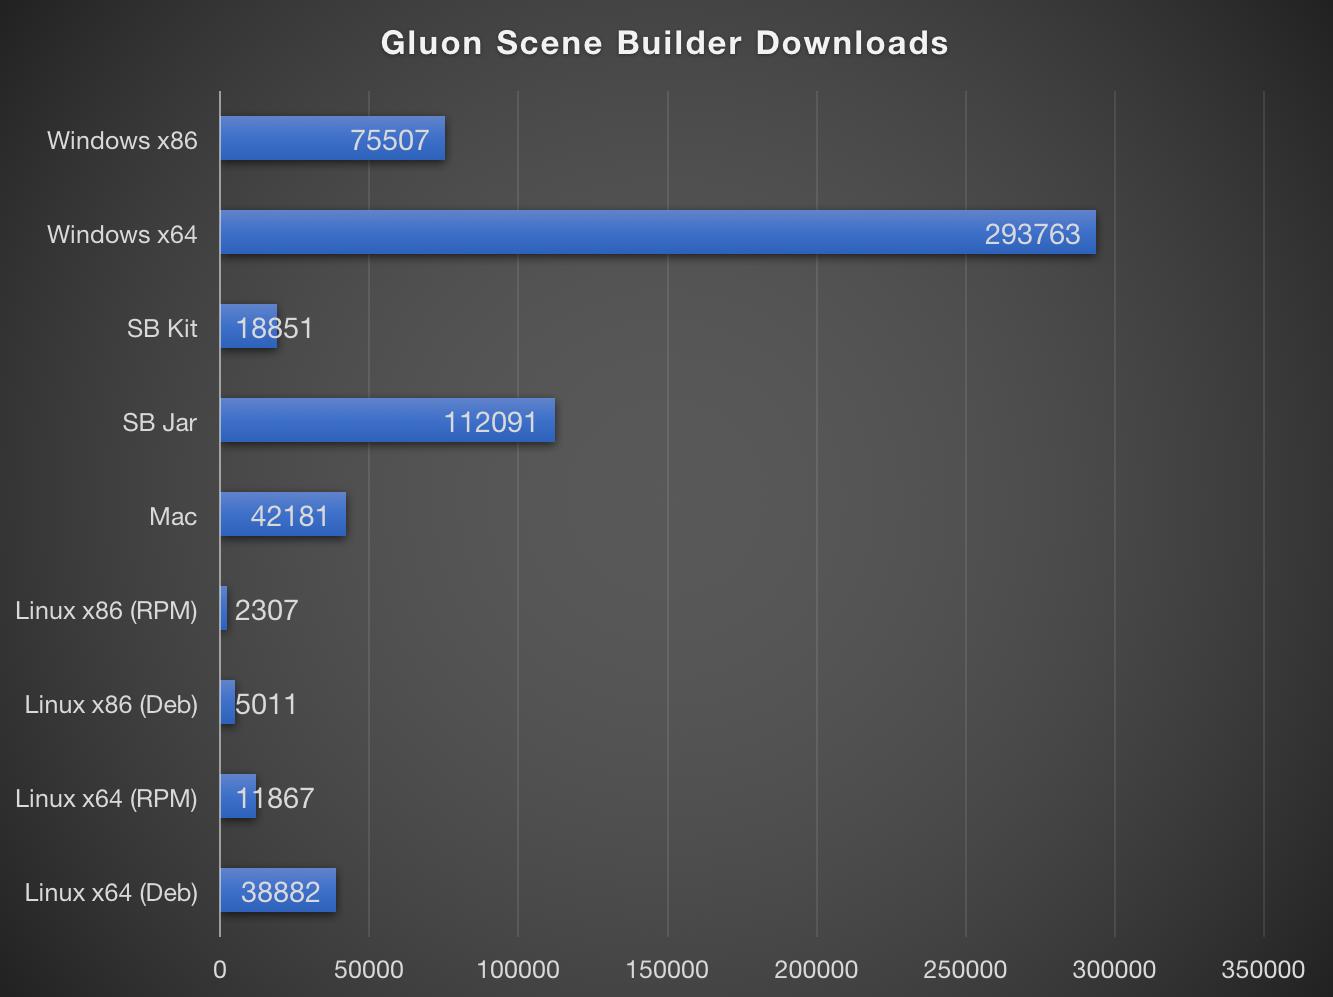 The JavaFX Hidden Economy - Gluon